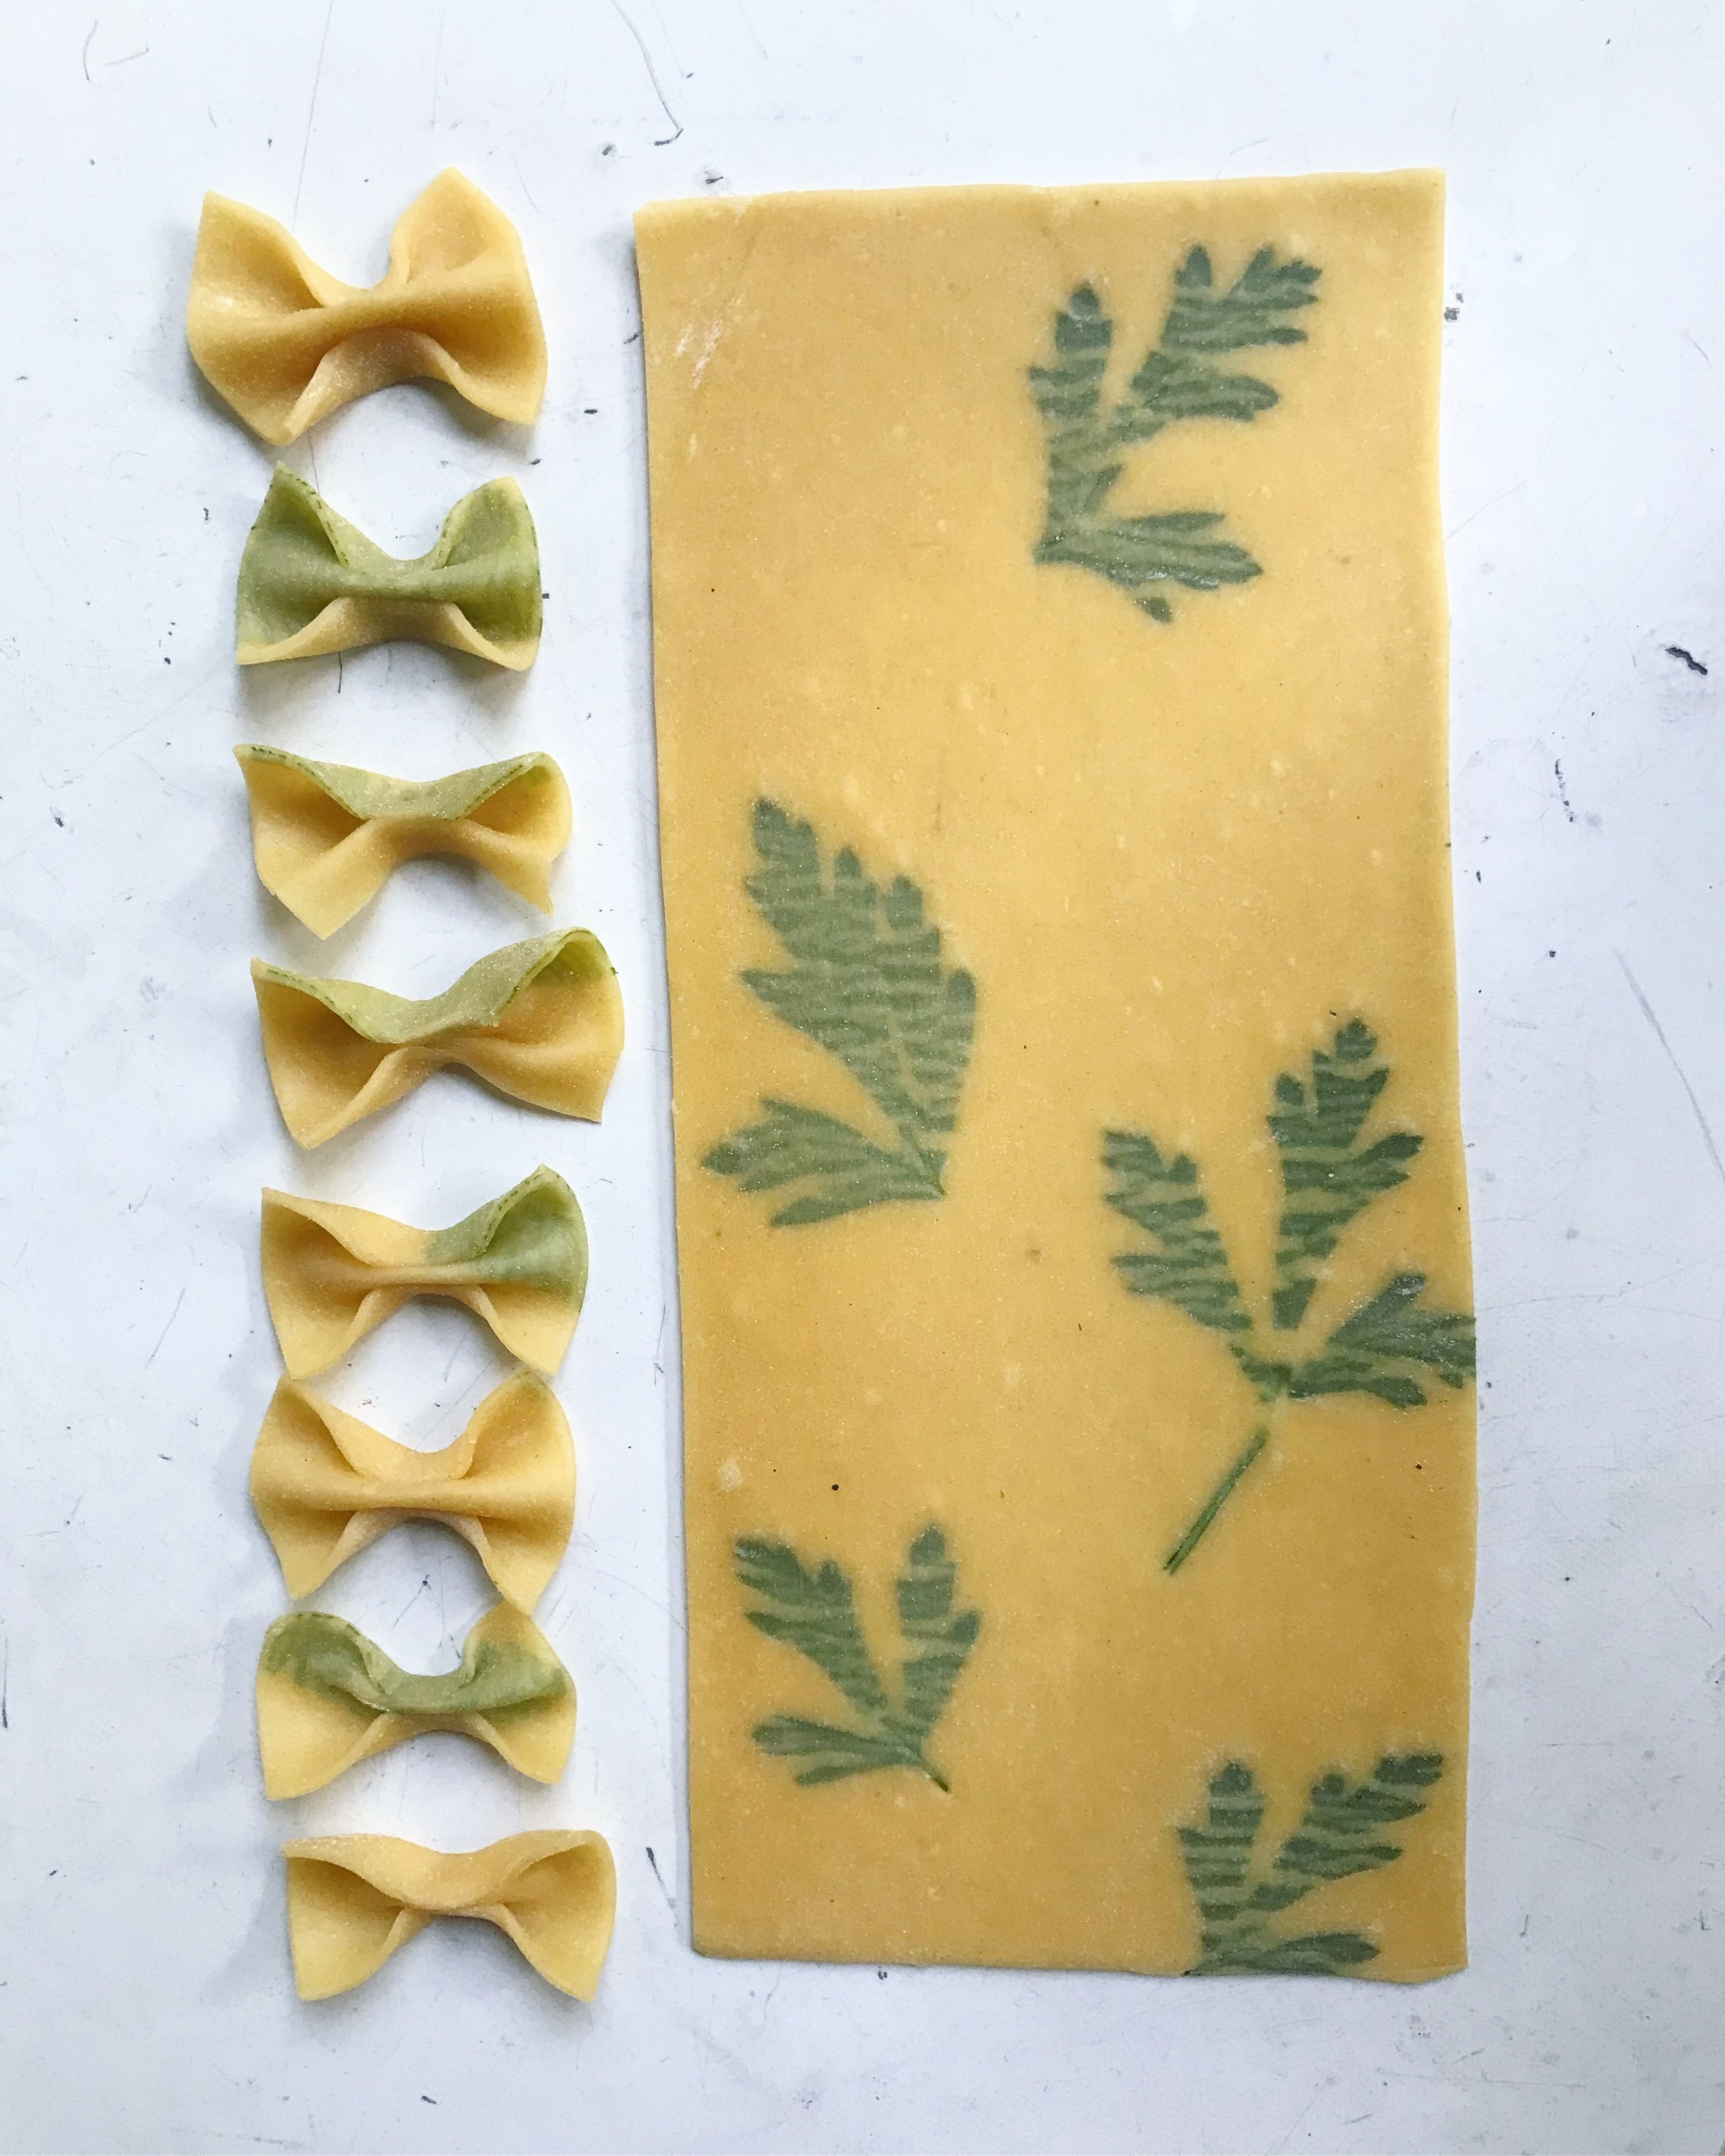 Homemade pasta edible flowers 2